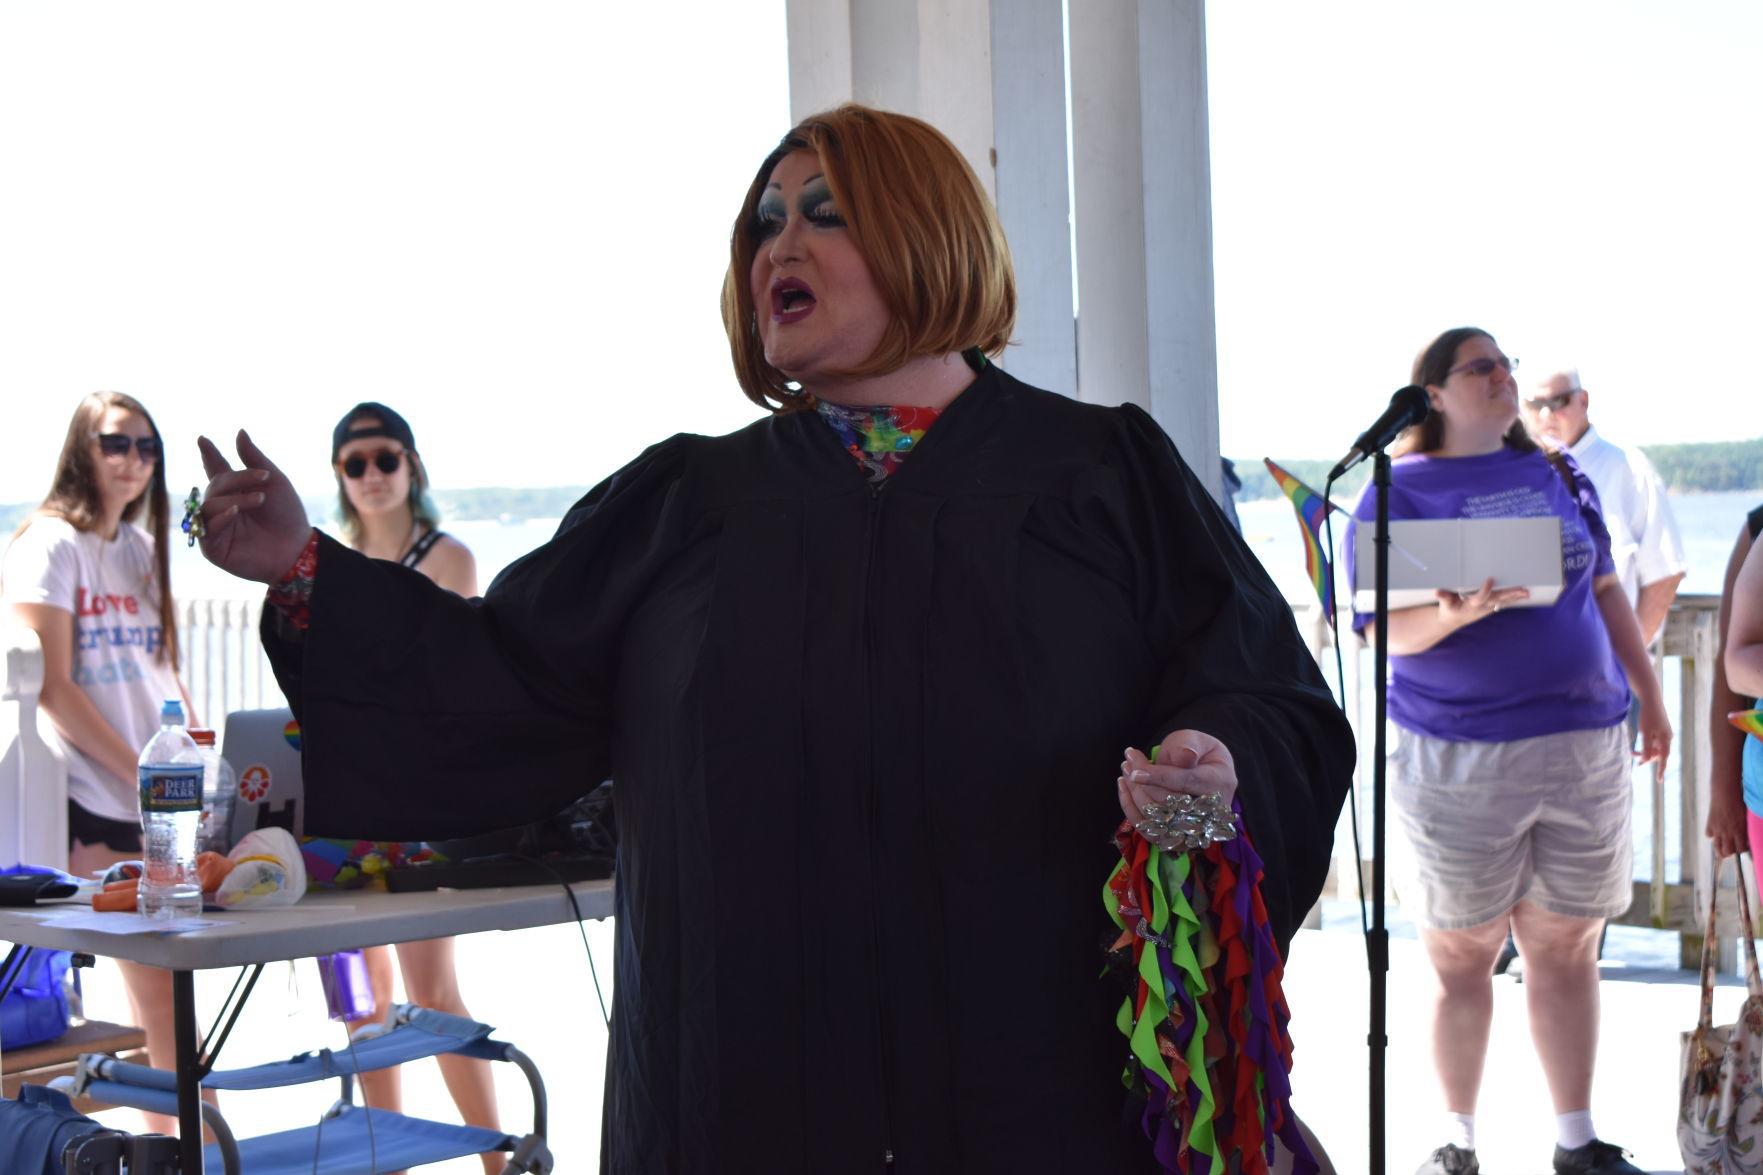 Maryland leonardtown bisexual women